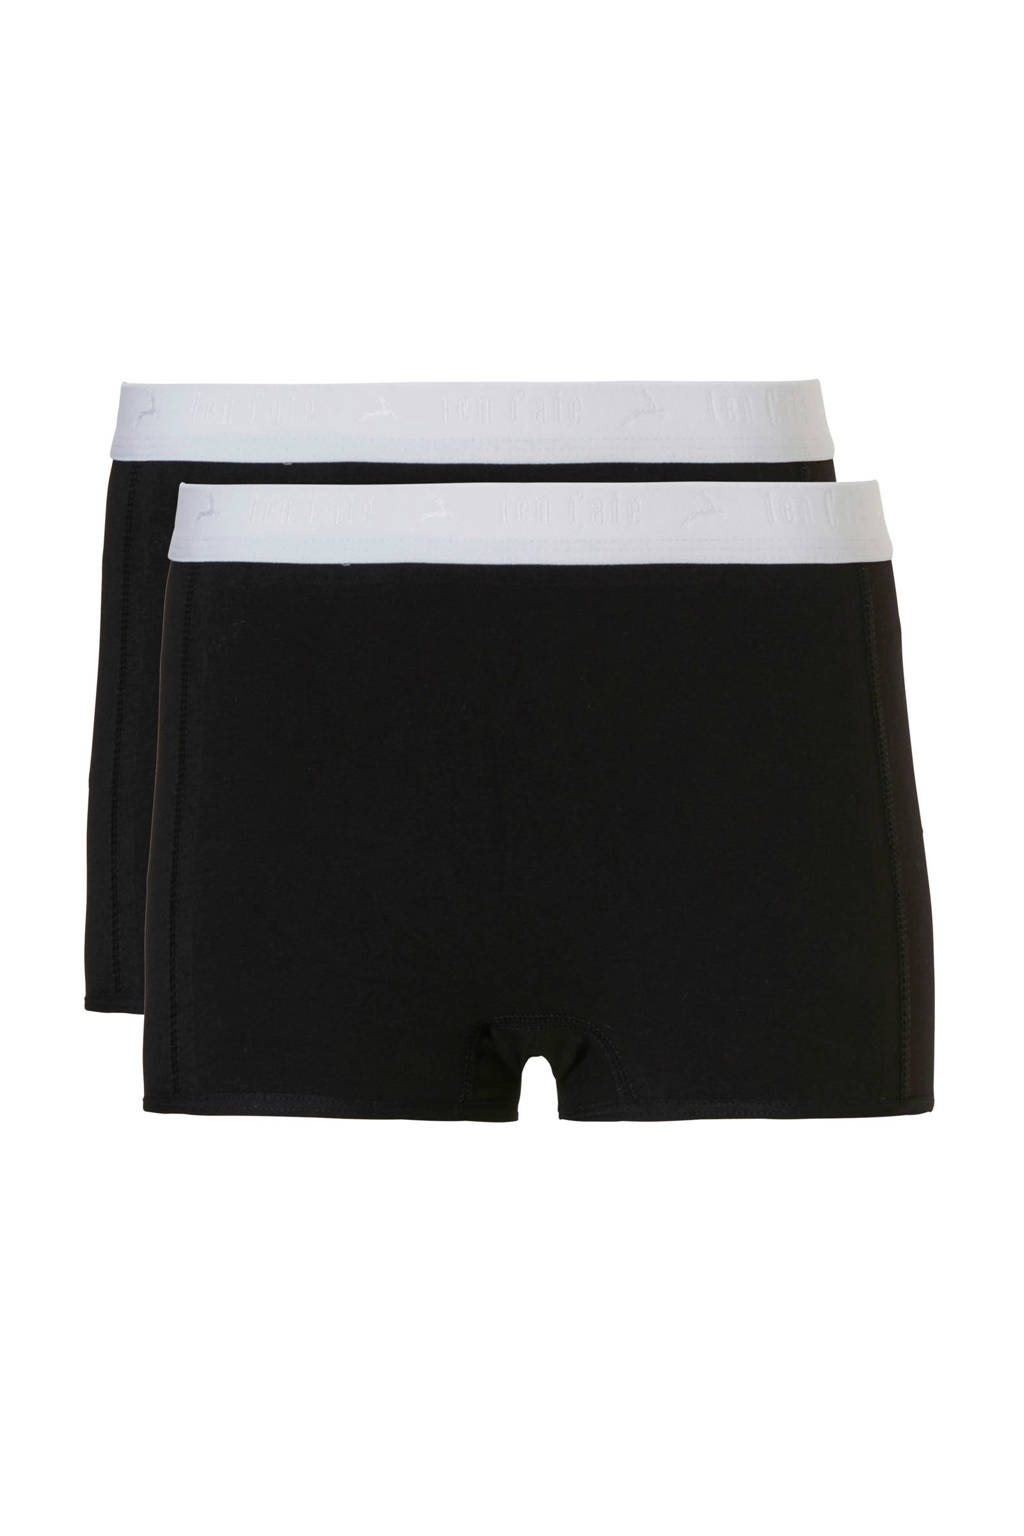 ten Cate Basic teens short - set van 2 zwart, Zwart